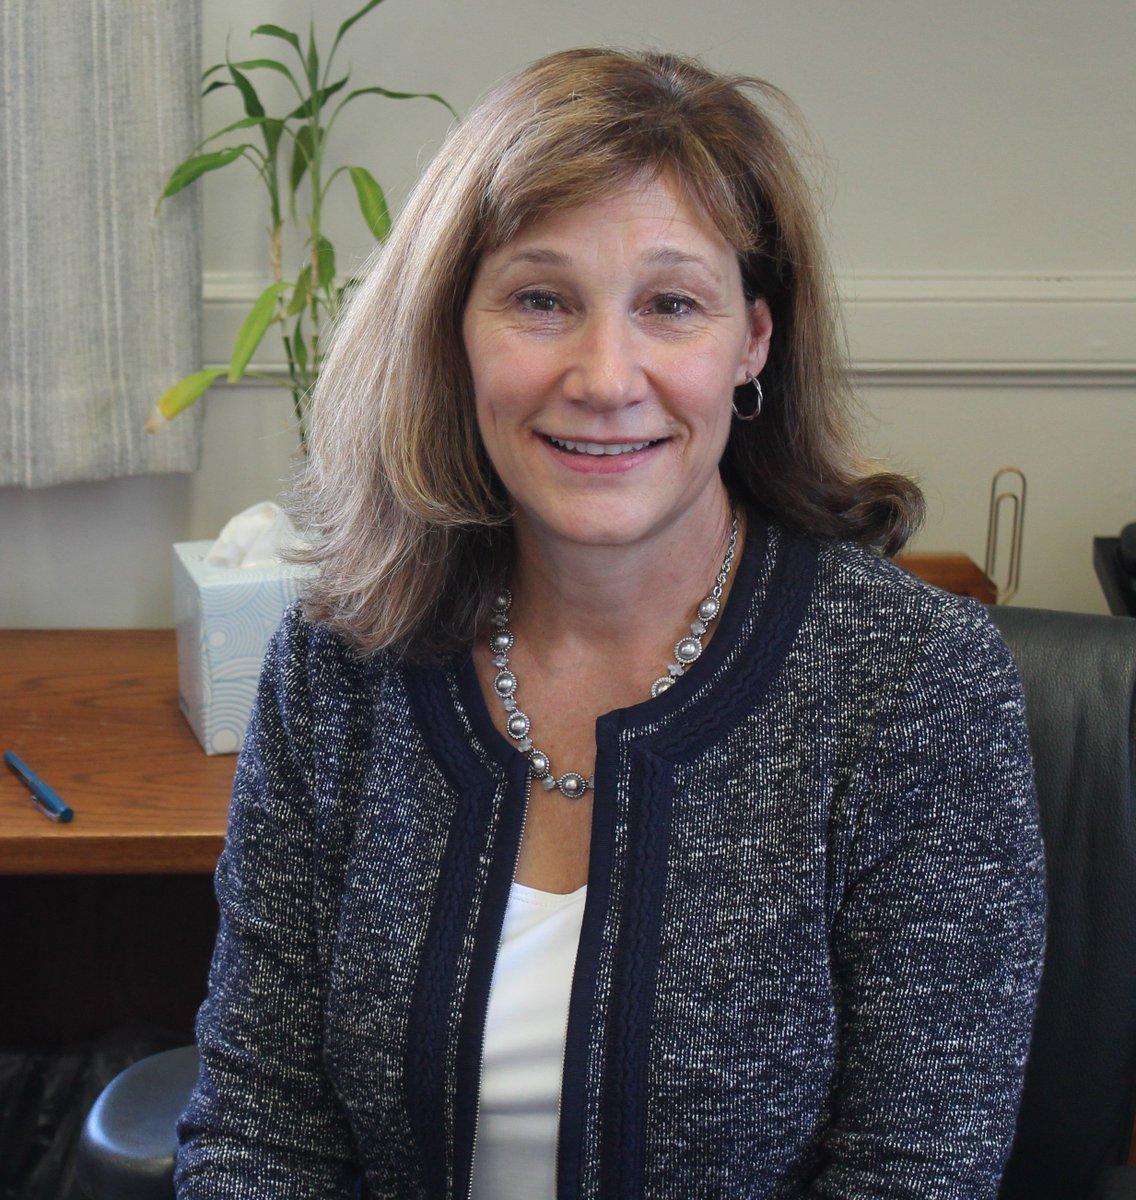 Judge Jill Fannin